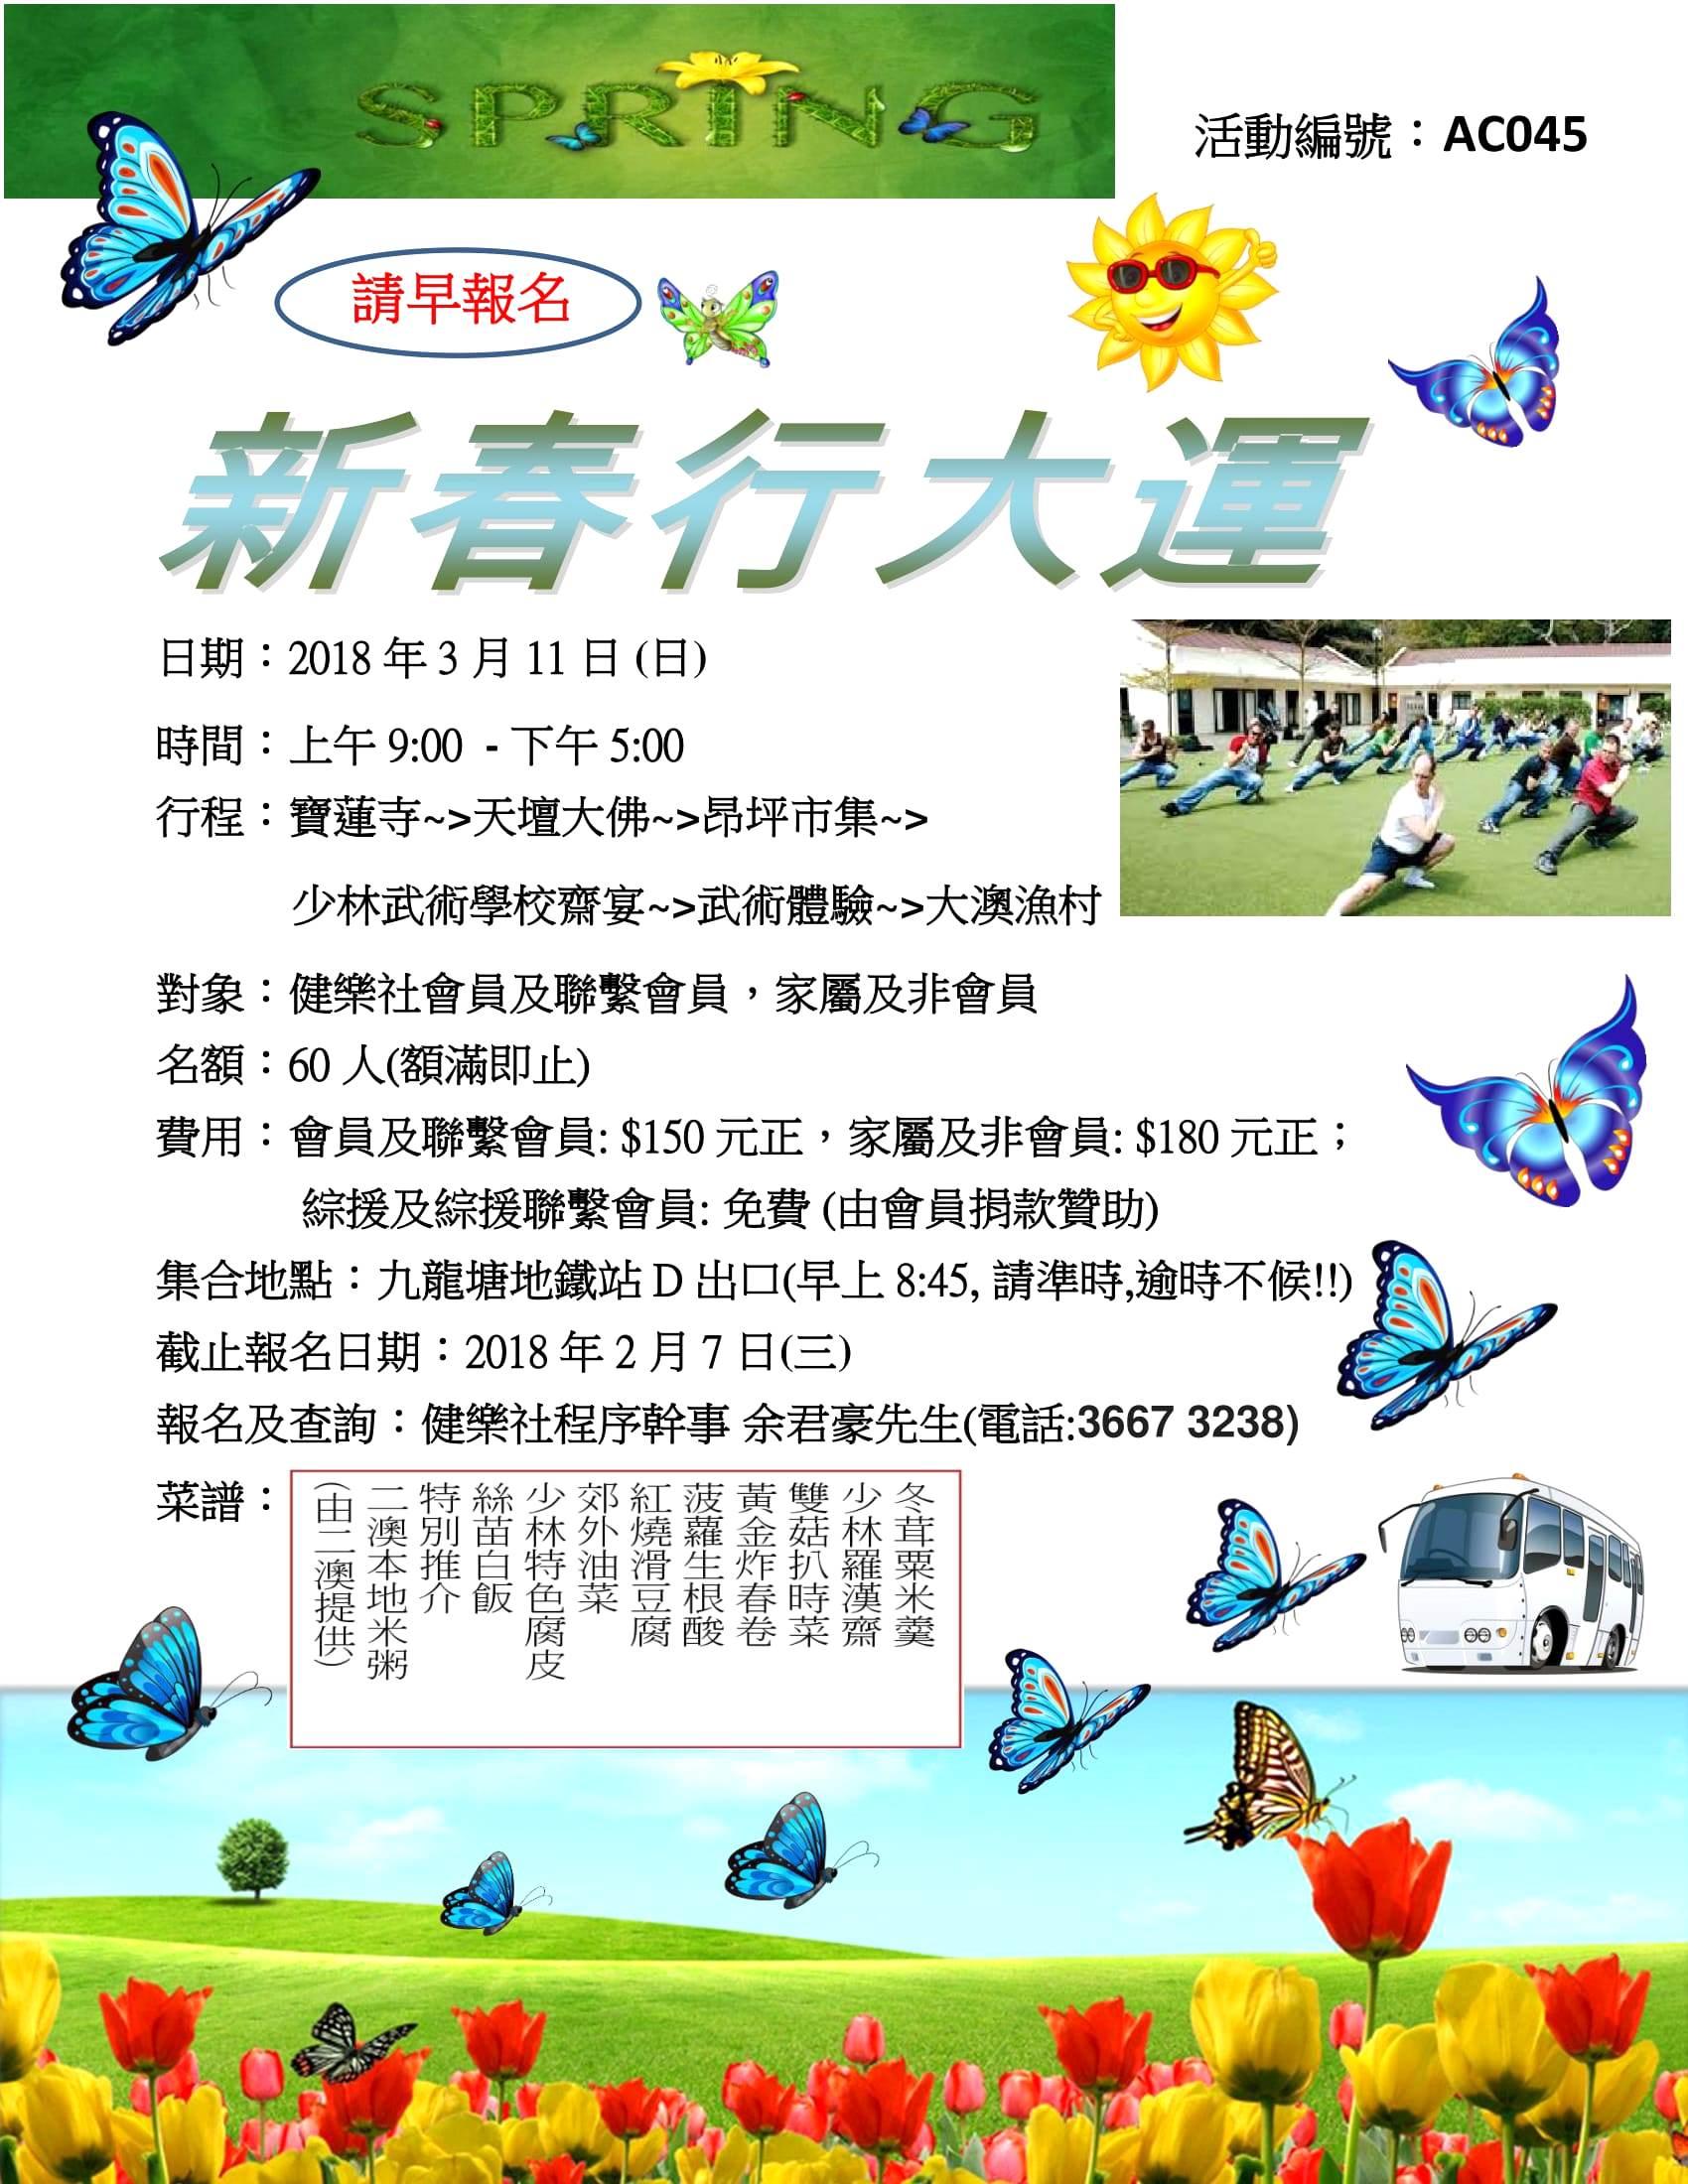 20180311-AC045-春季旅行-海報